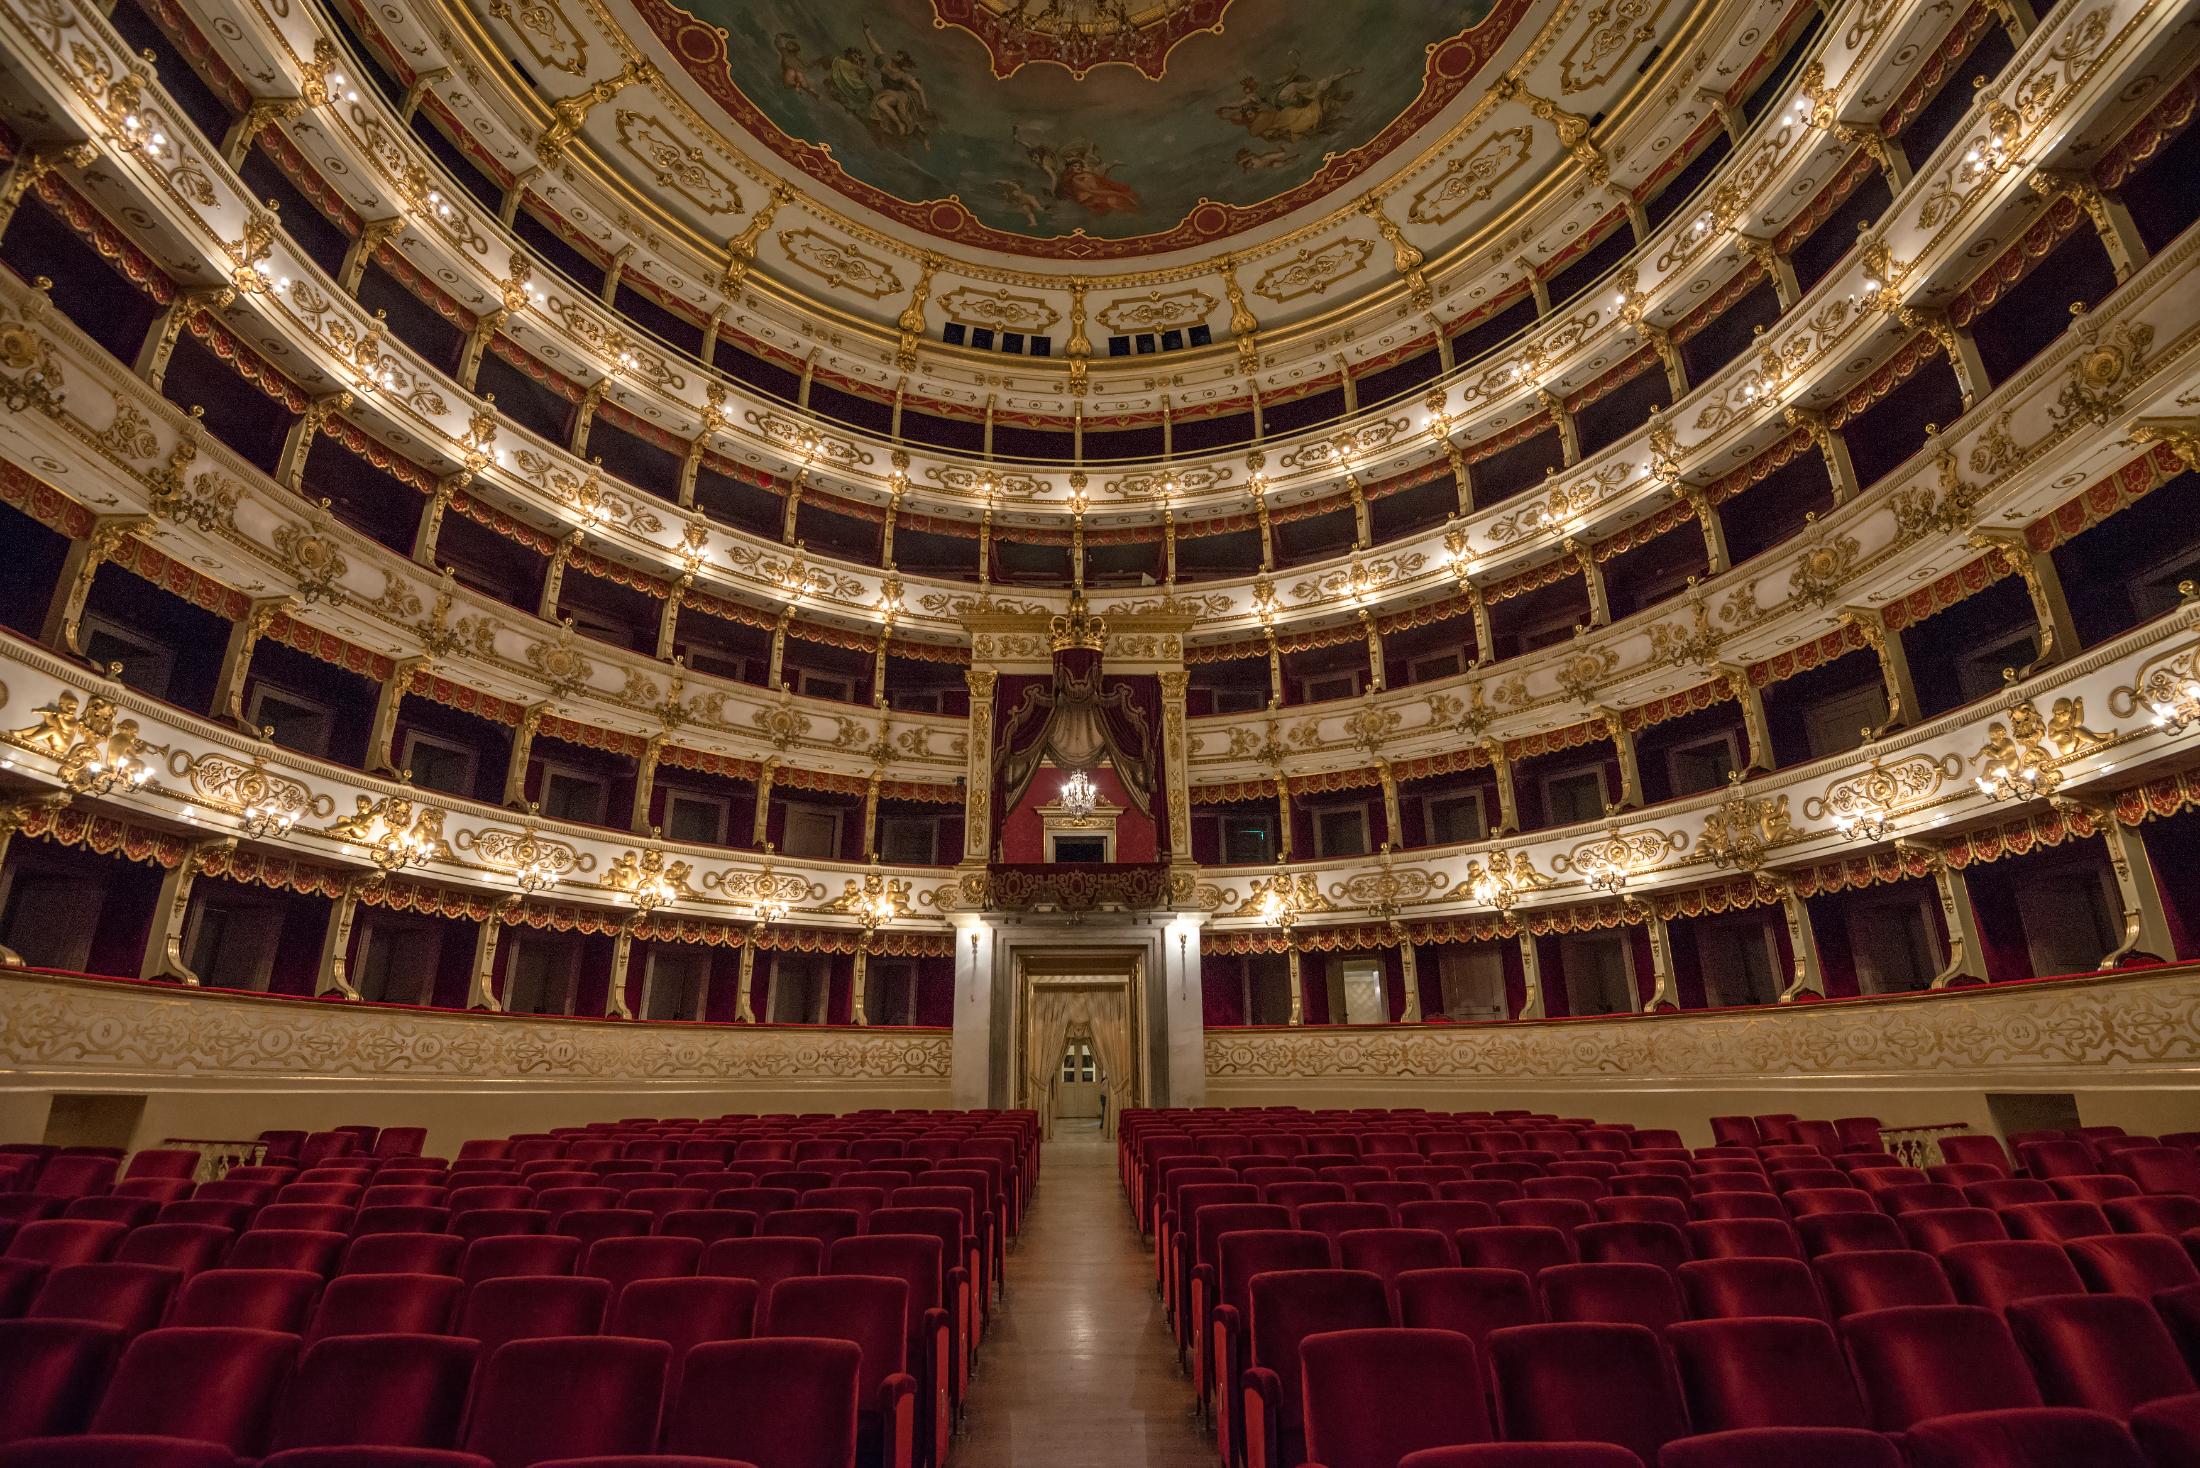 Interno del Teatro Regio